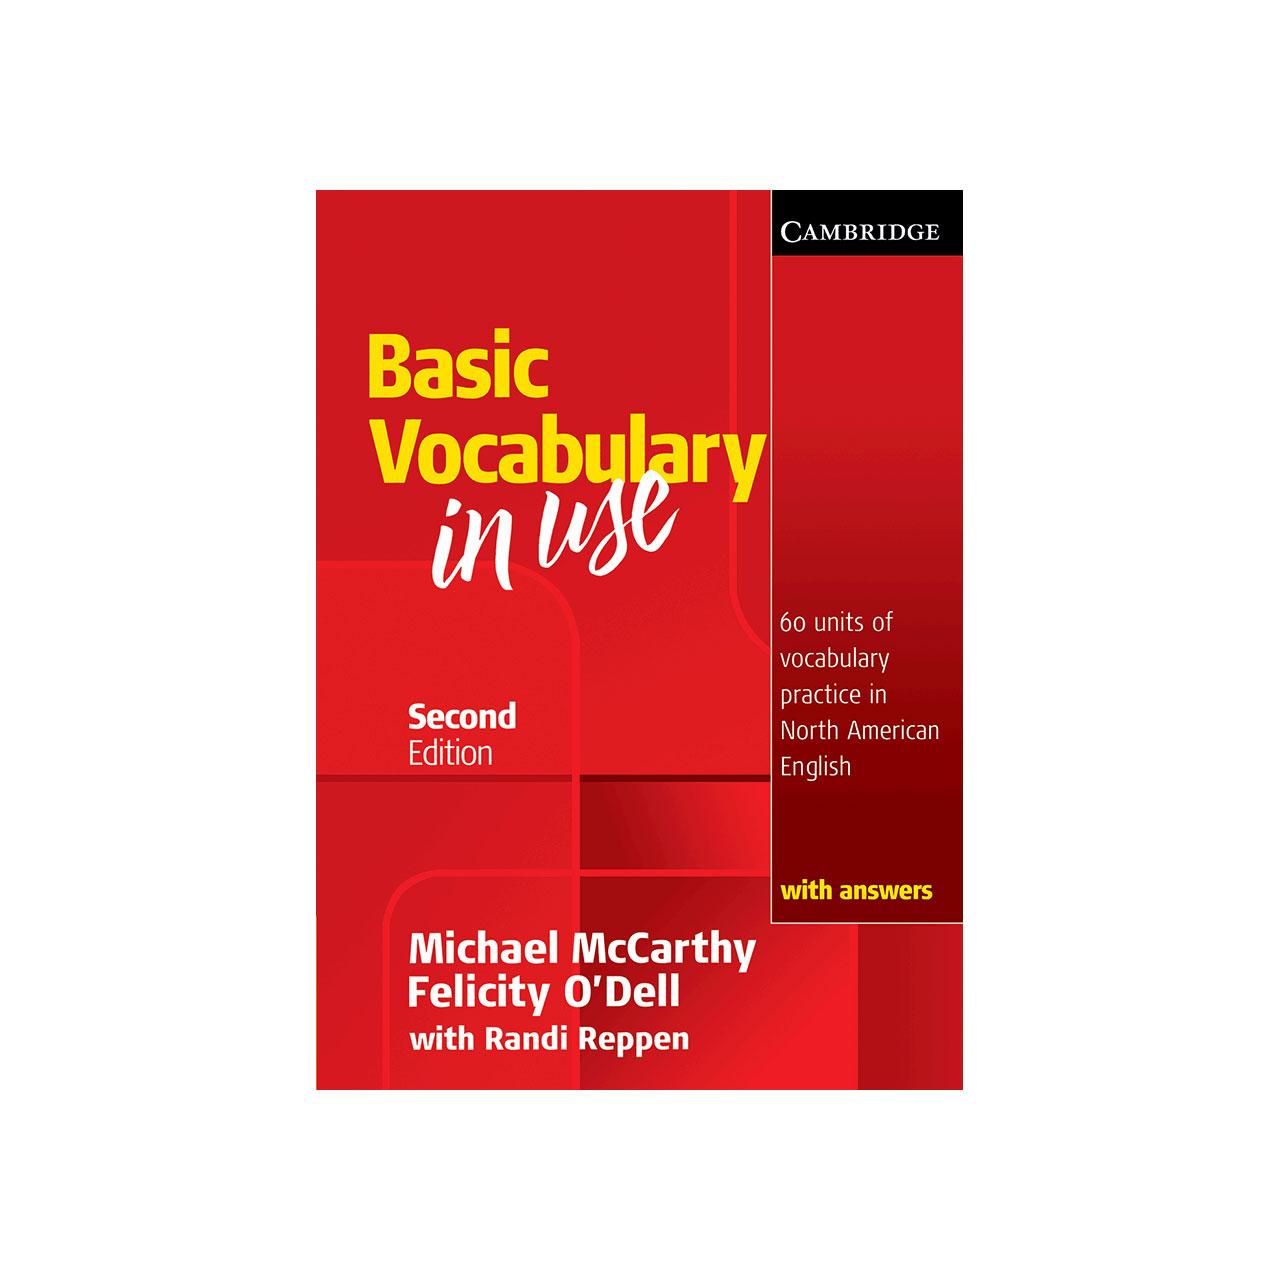 کتاب زبان Vocabulary in Use Basic 2nd انتشارات جنگل